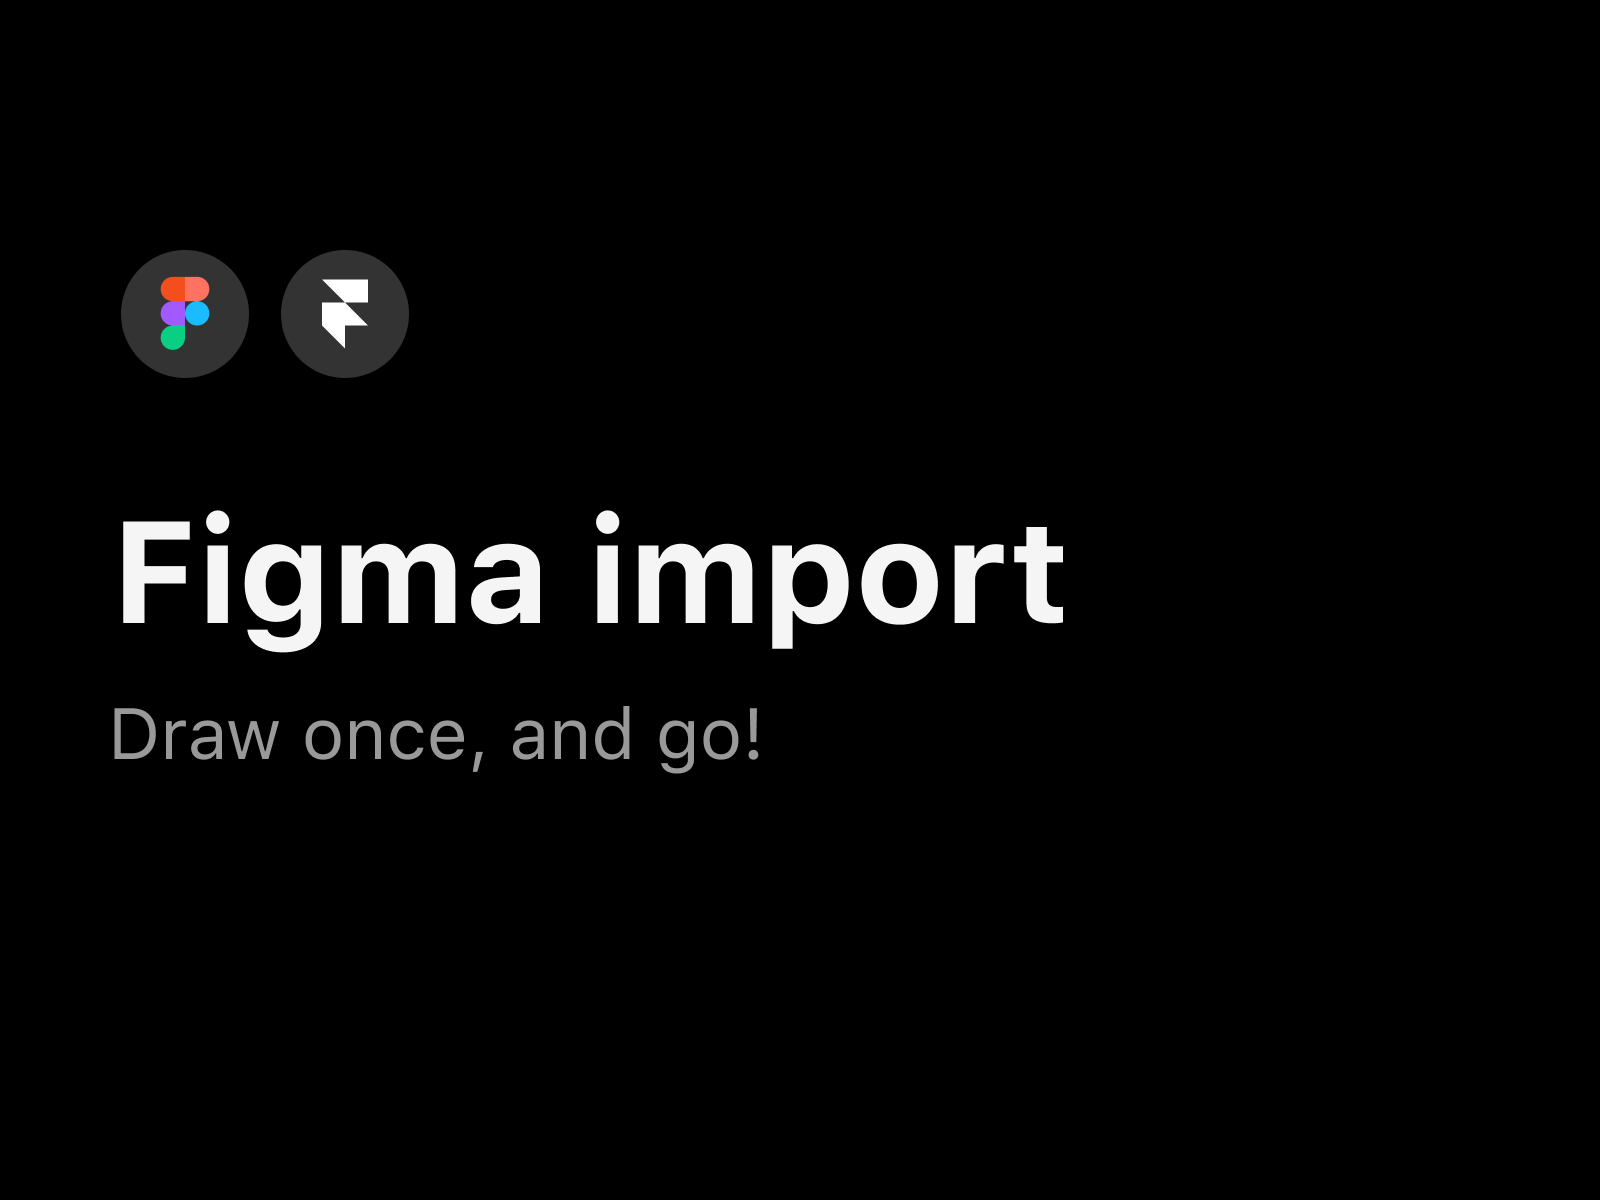 Figma Import